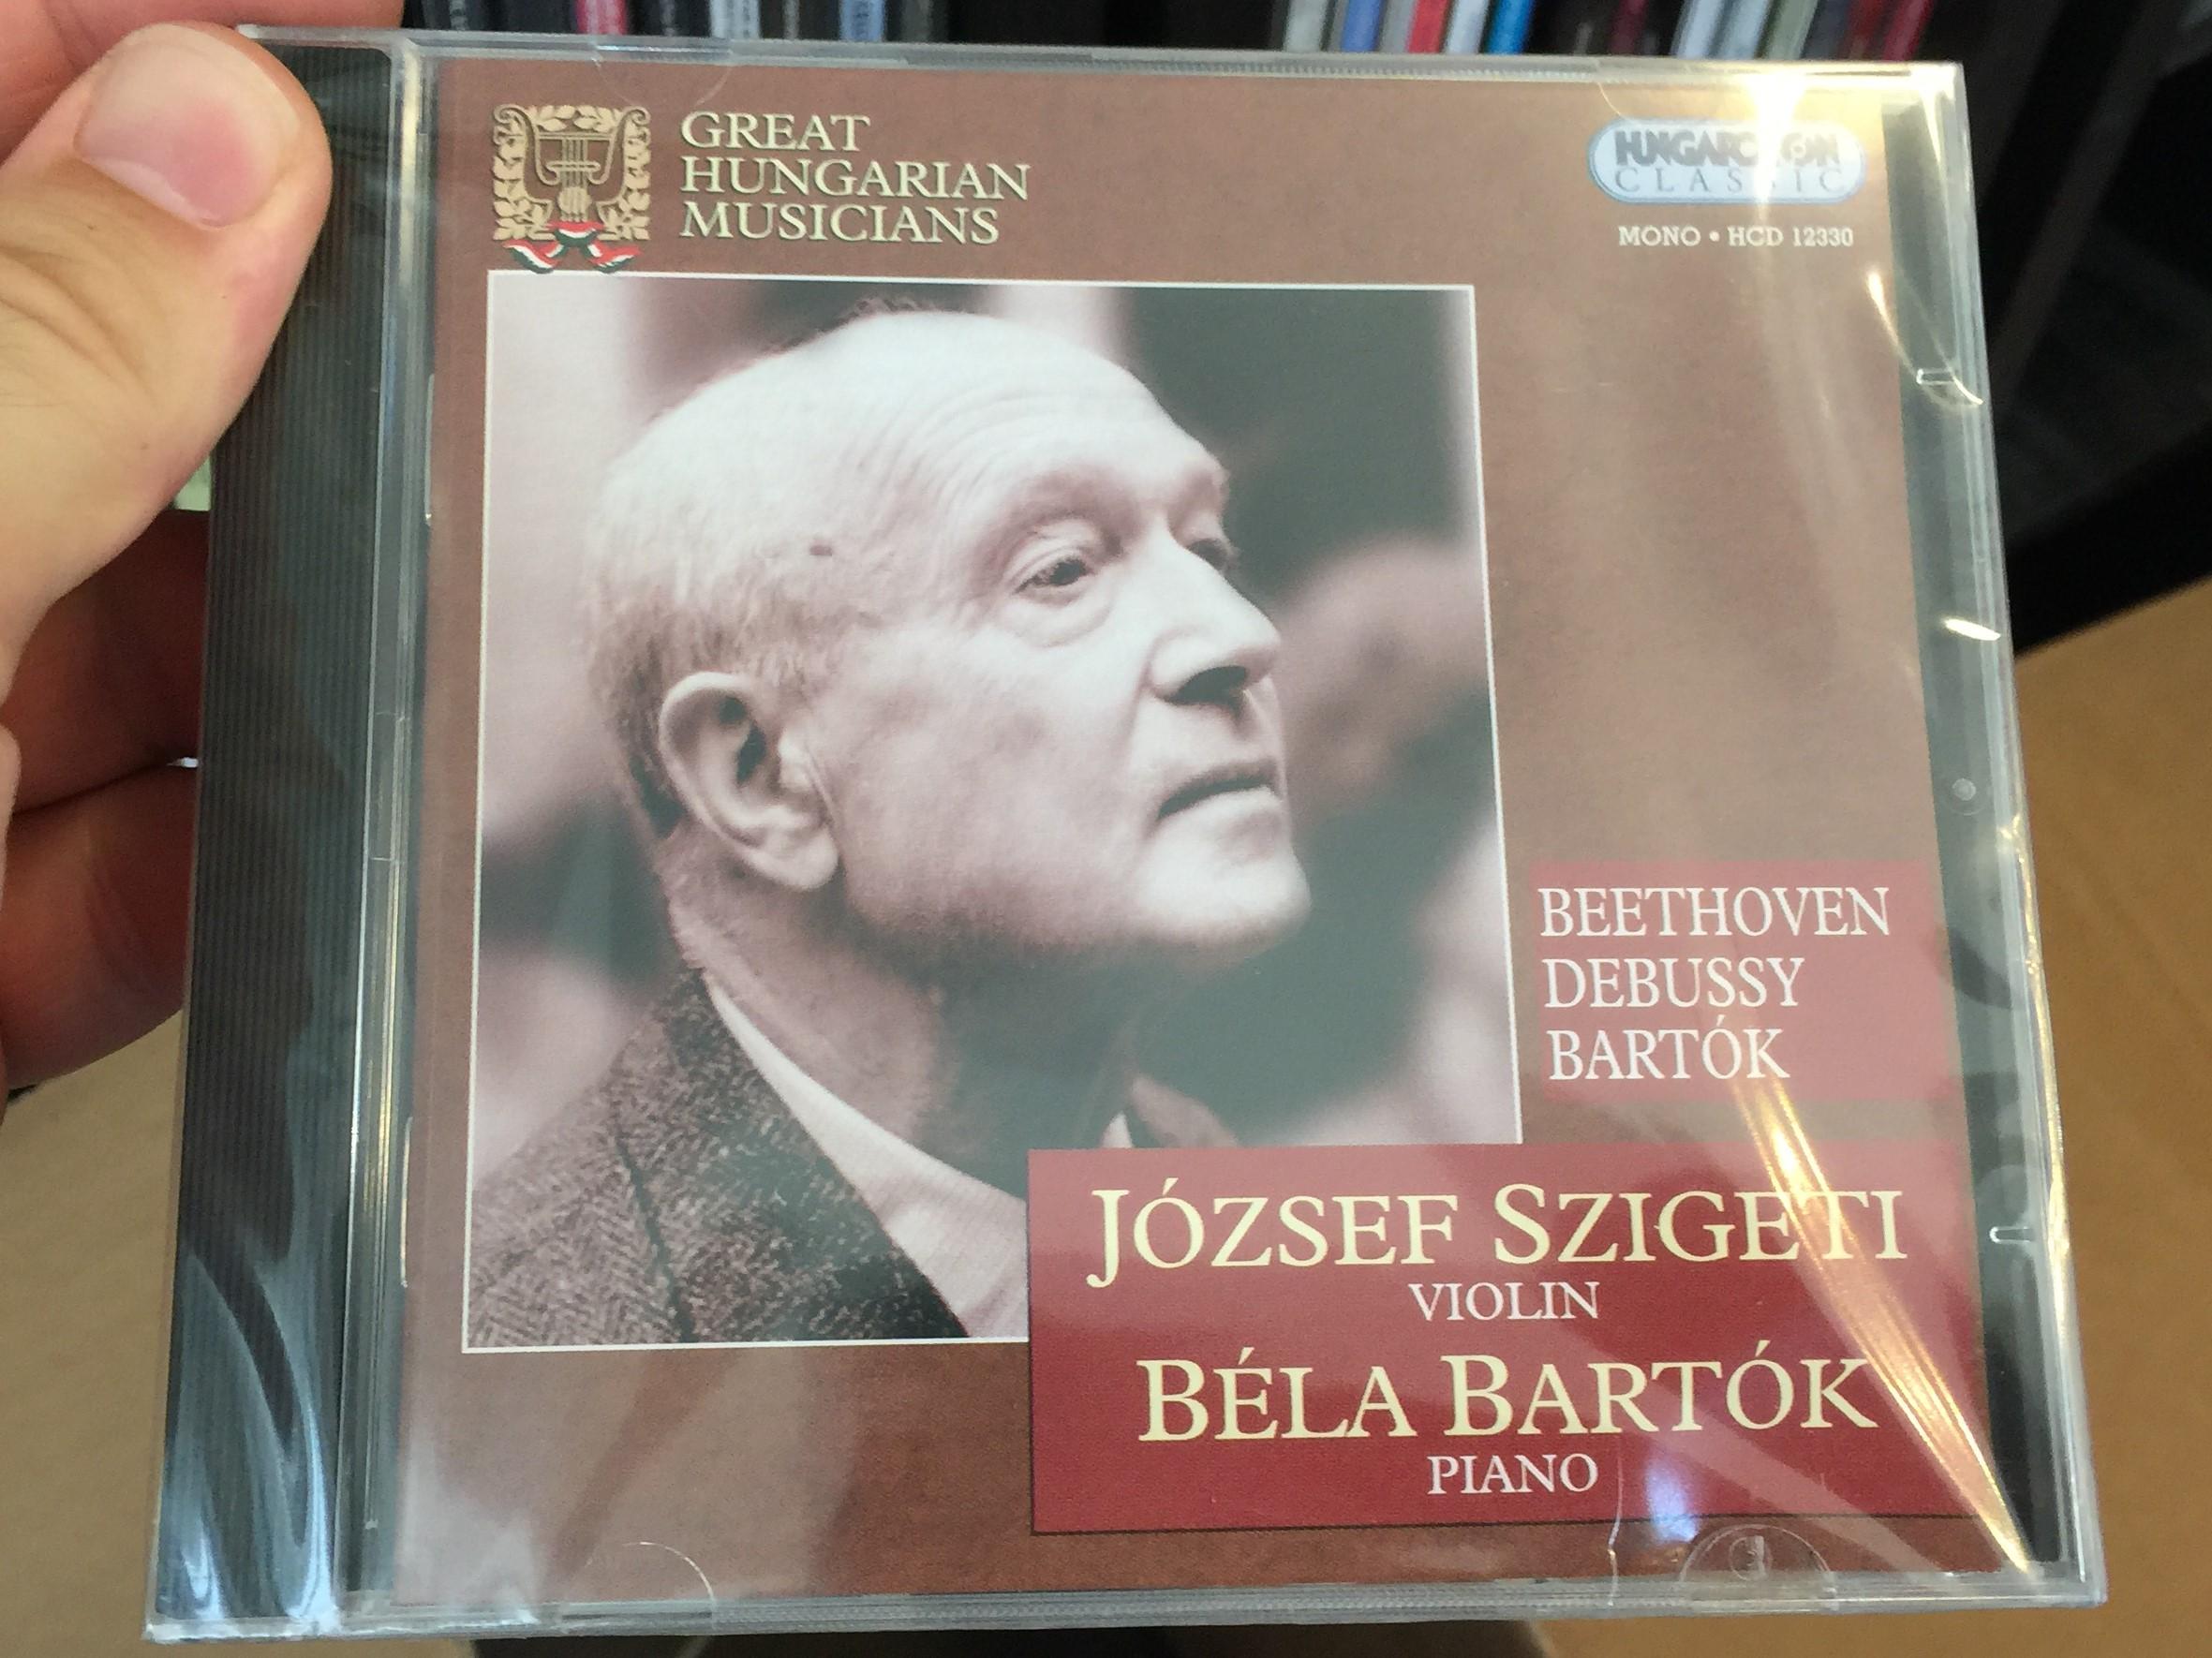 great-hungarian-musicians-beethoven-debussy-bart-k-j-zsef-szigeti-violin-b-la-bart-k-piano-hungaroton-classic-audio-cd-2001-mono-hcd-12330-1-.jpg